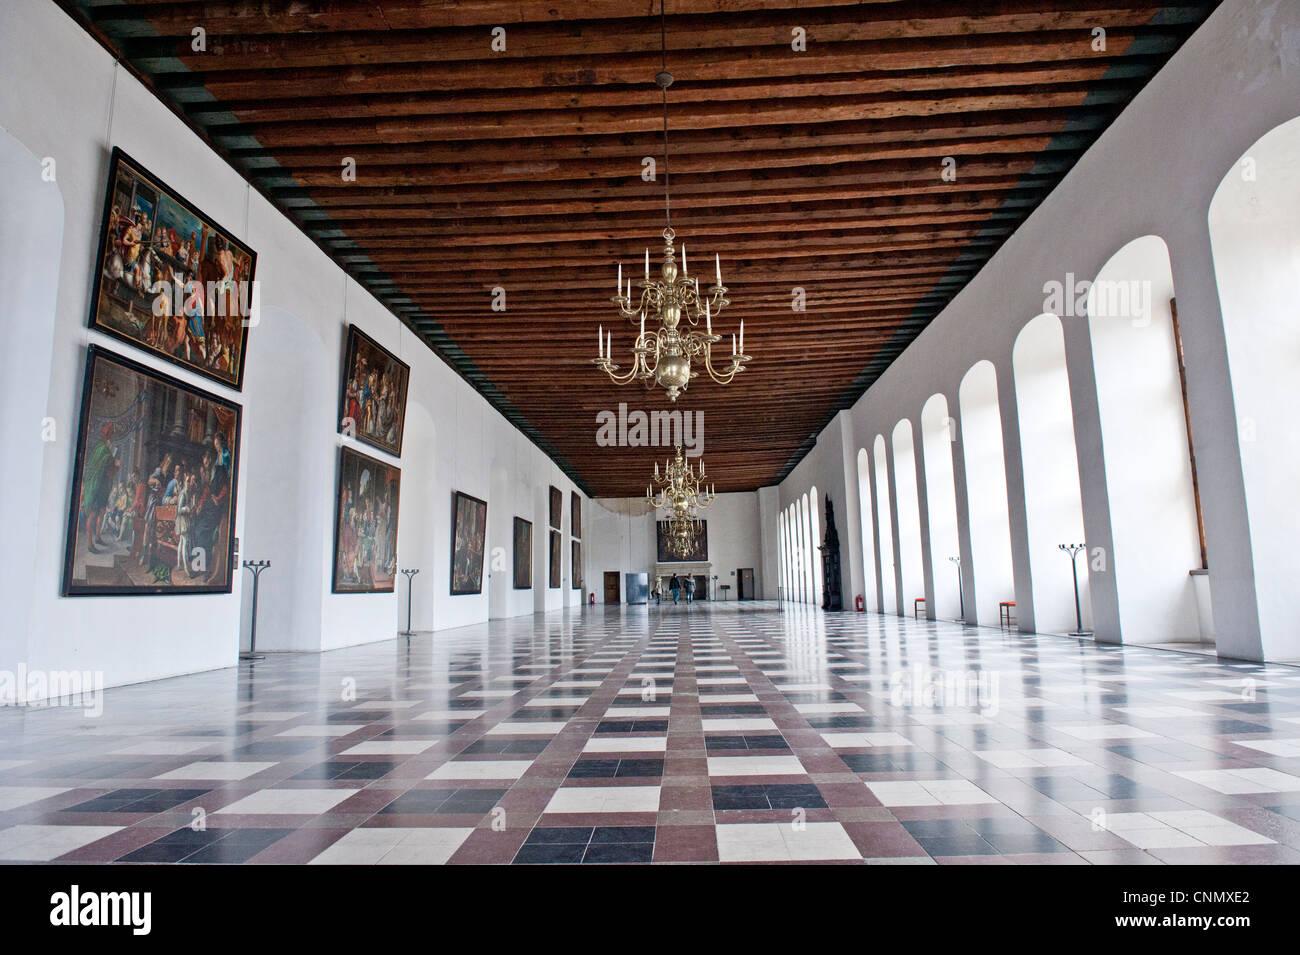 The hall of Kronborg Castle in Elsinore Denmark - Stock Image